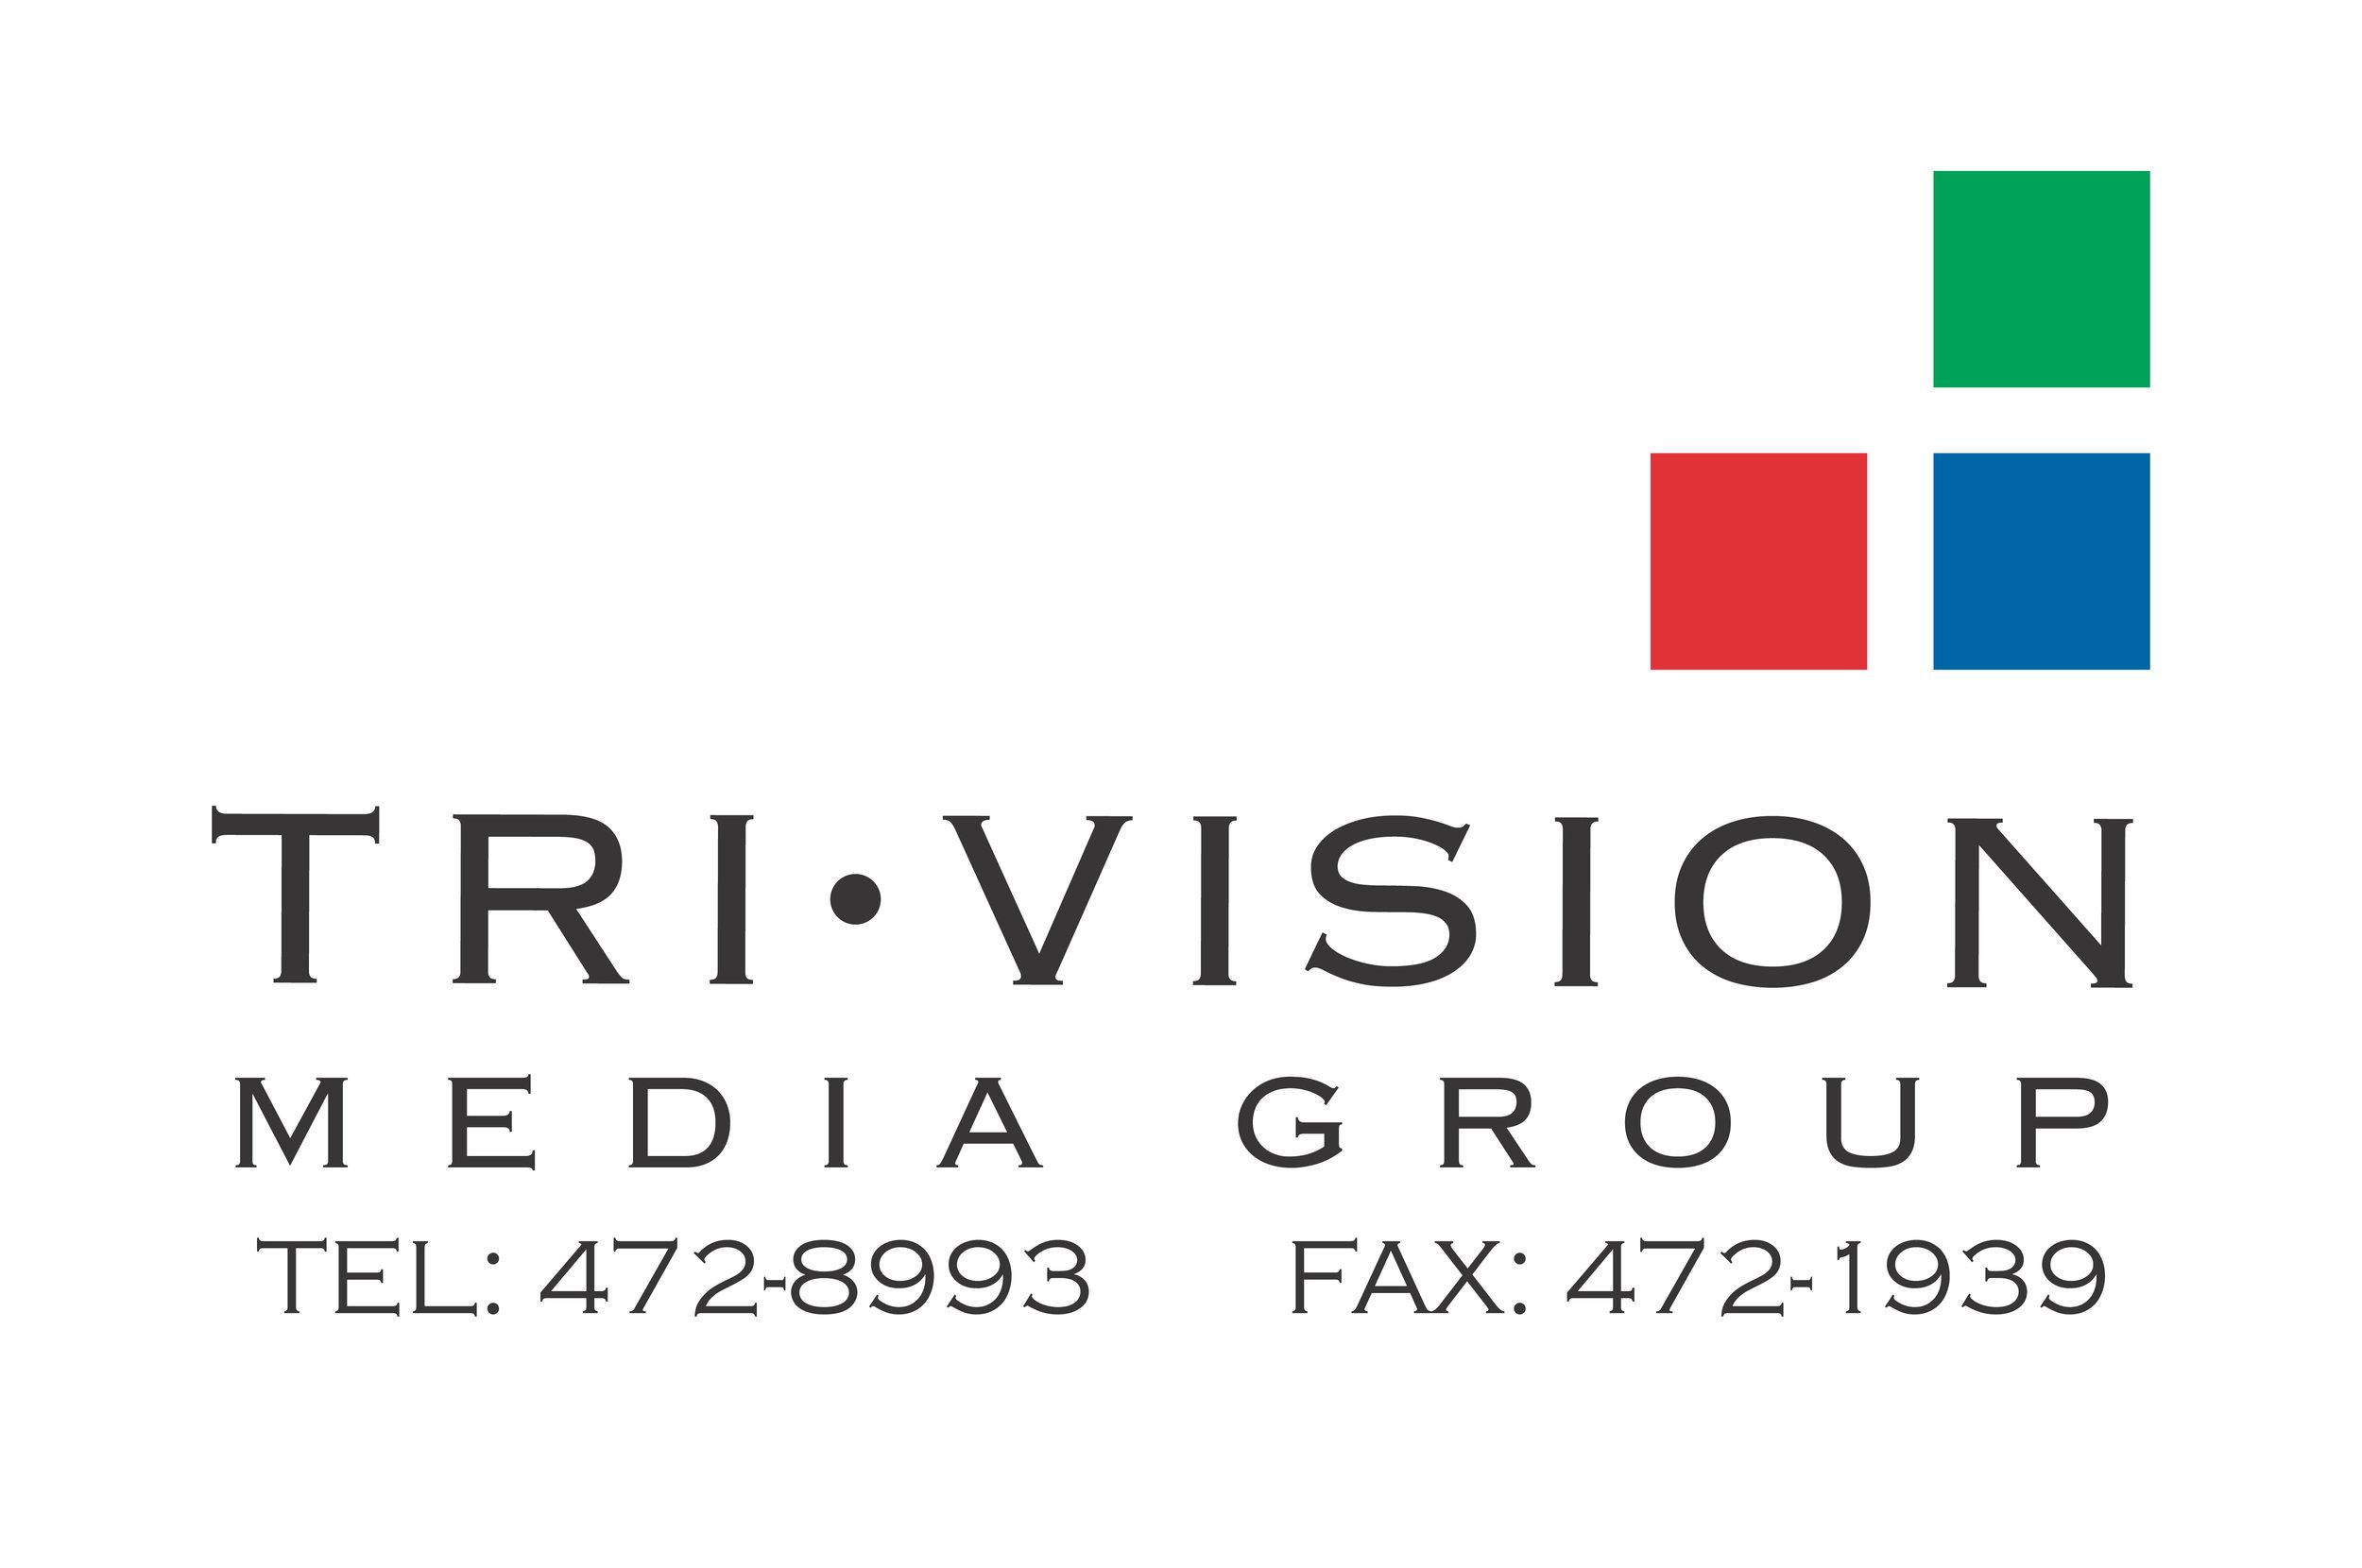 trivision Sticker logo2.jpg